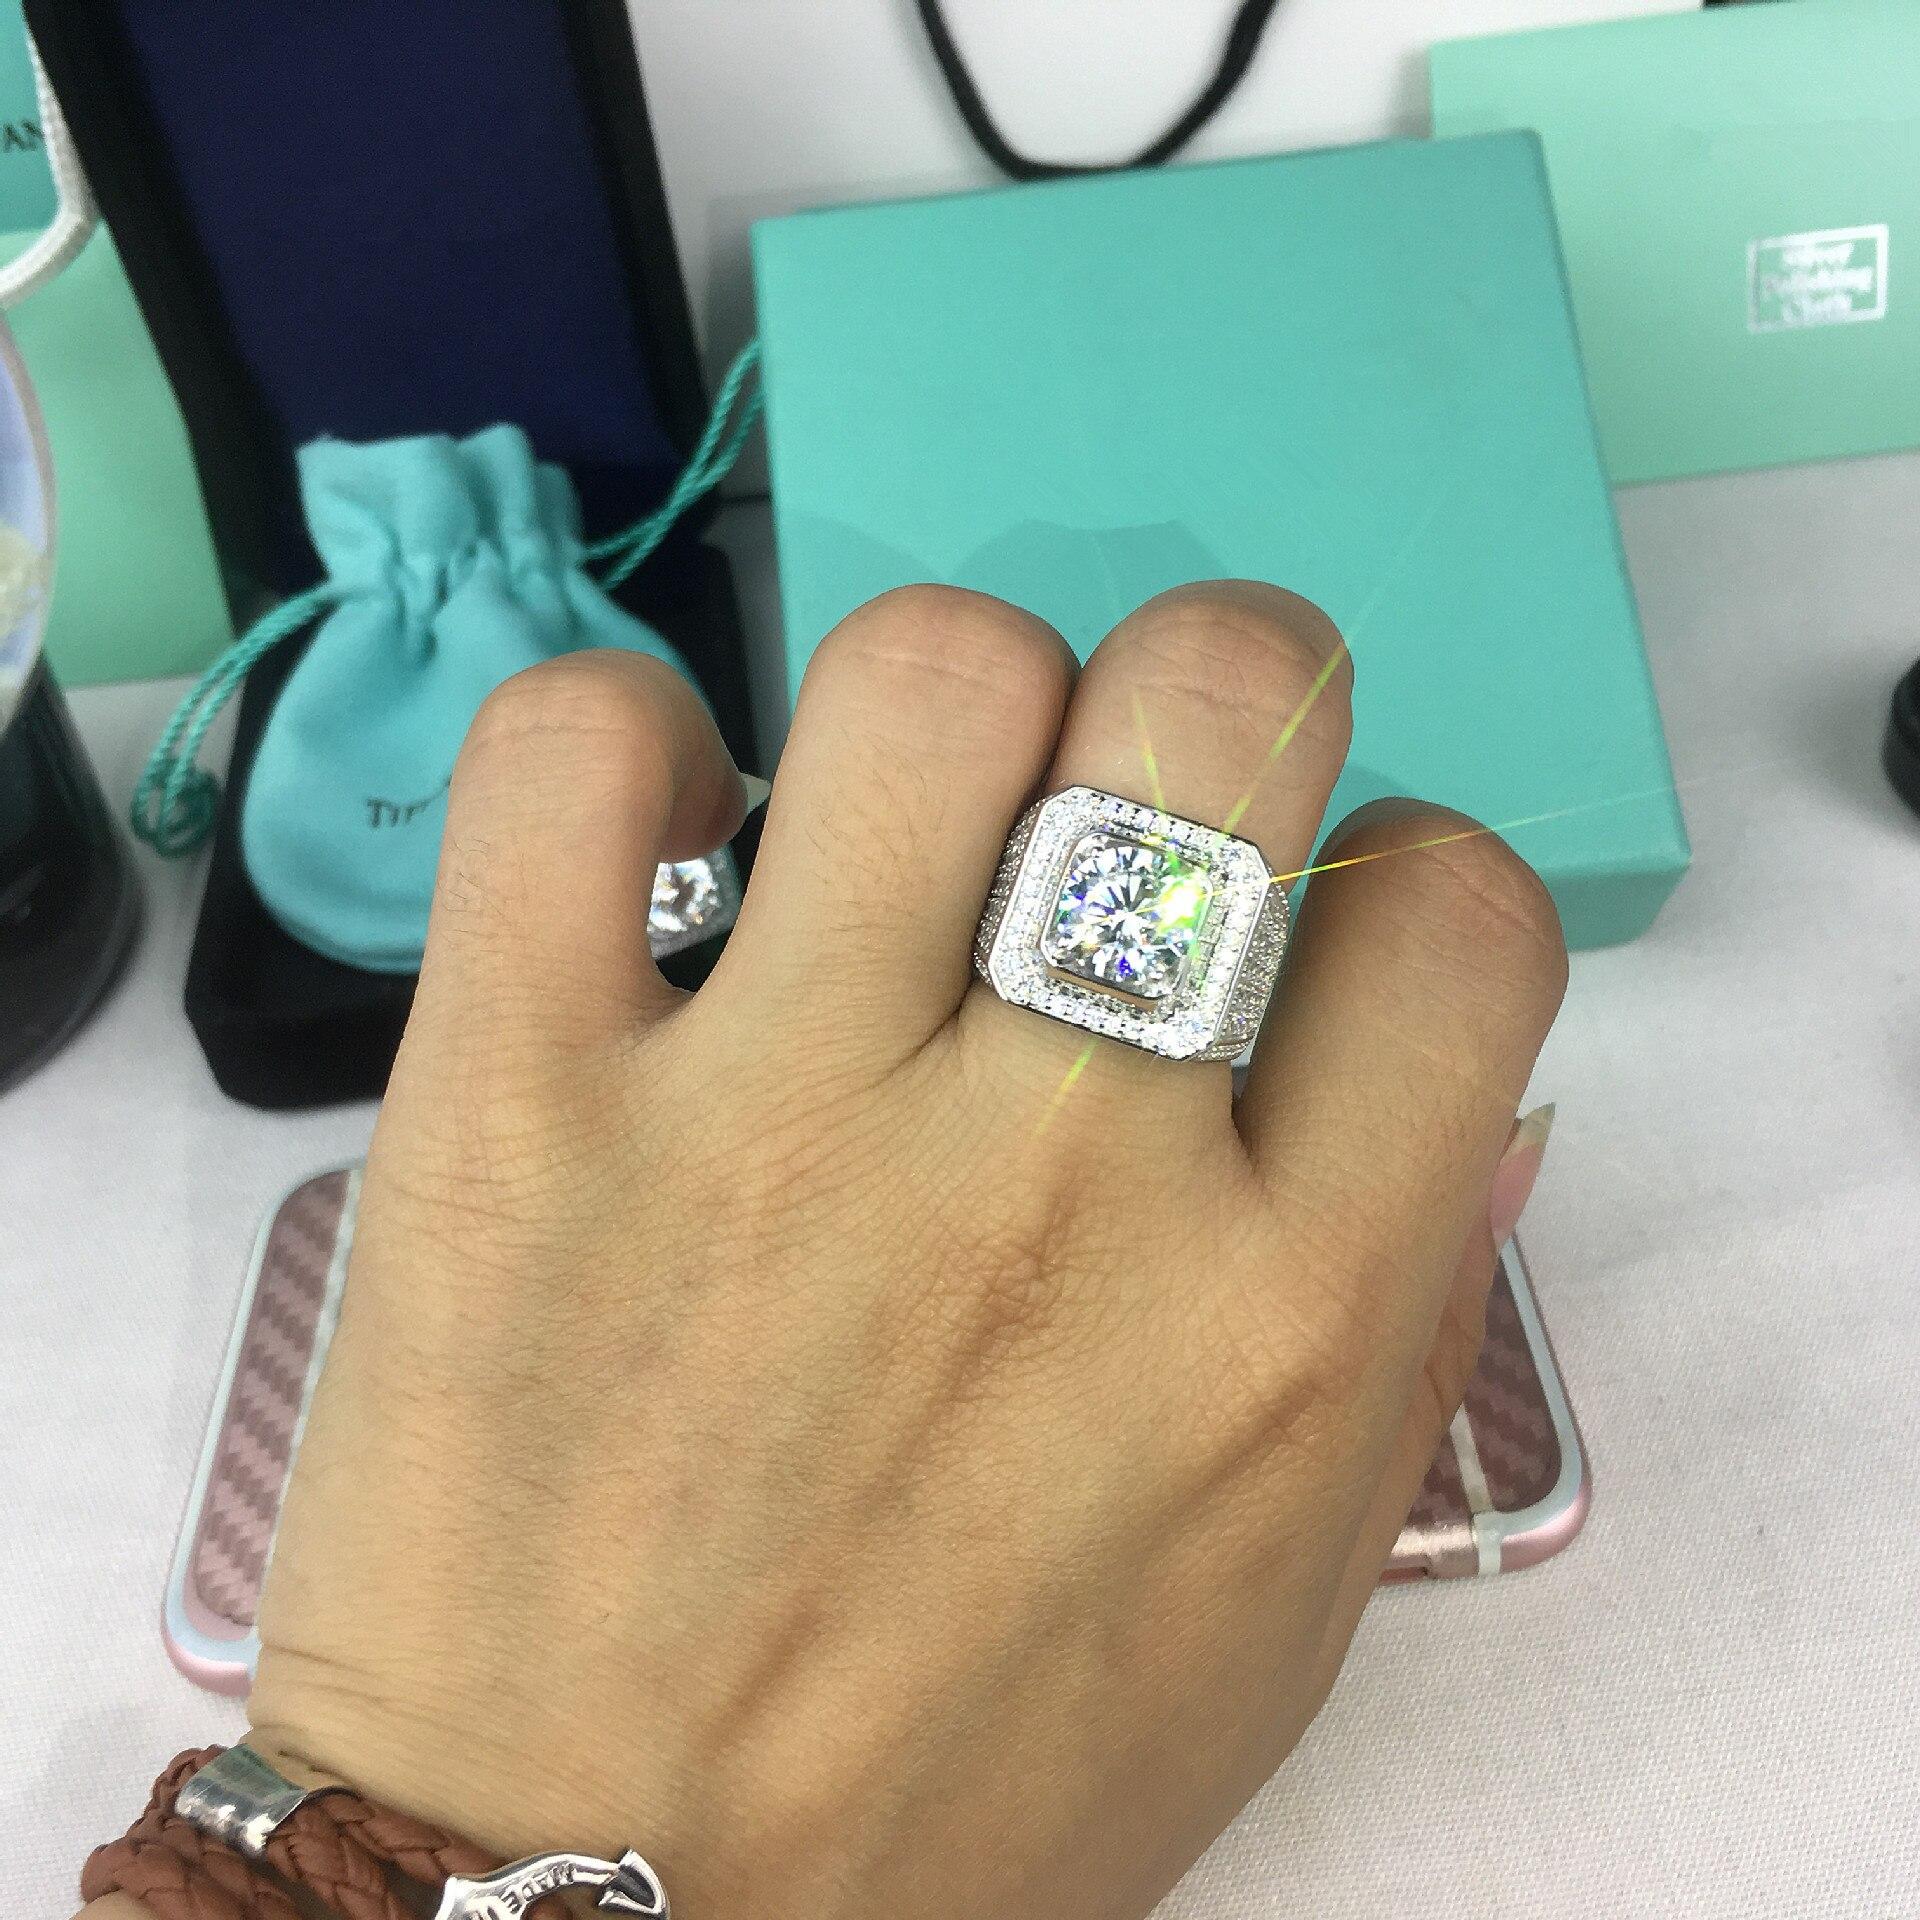 925 Silver VS2 2 Carats Diamond Ring for Men Anillos Bizuteria Gemstone silver 925 Jewelry bague diamant bijoux femme Rings